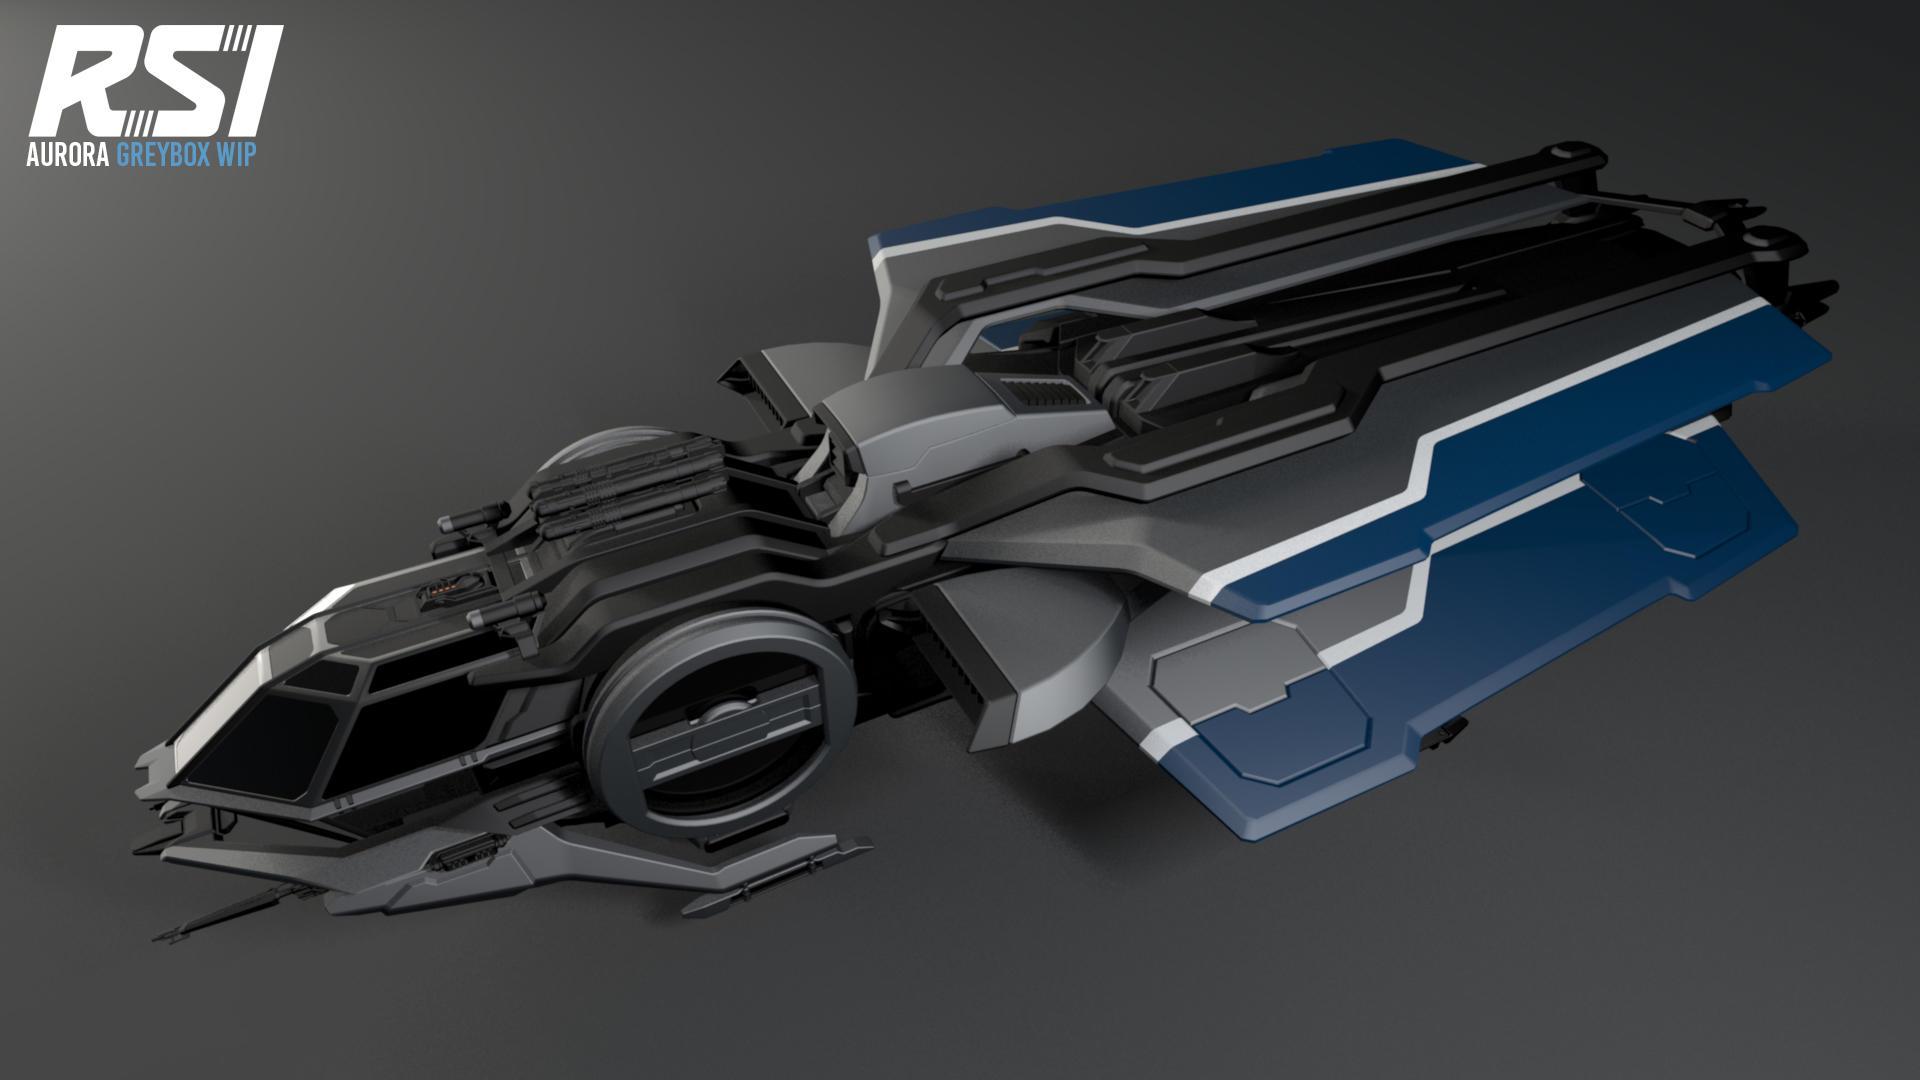 RSI Aurorga greybox rework